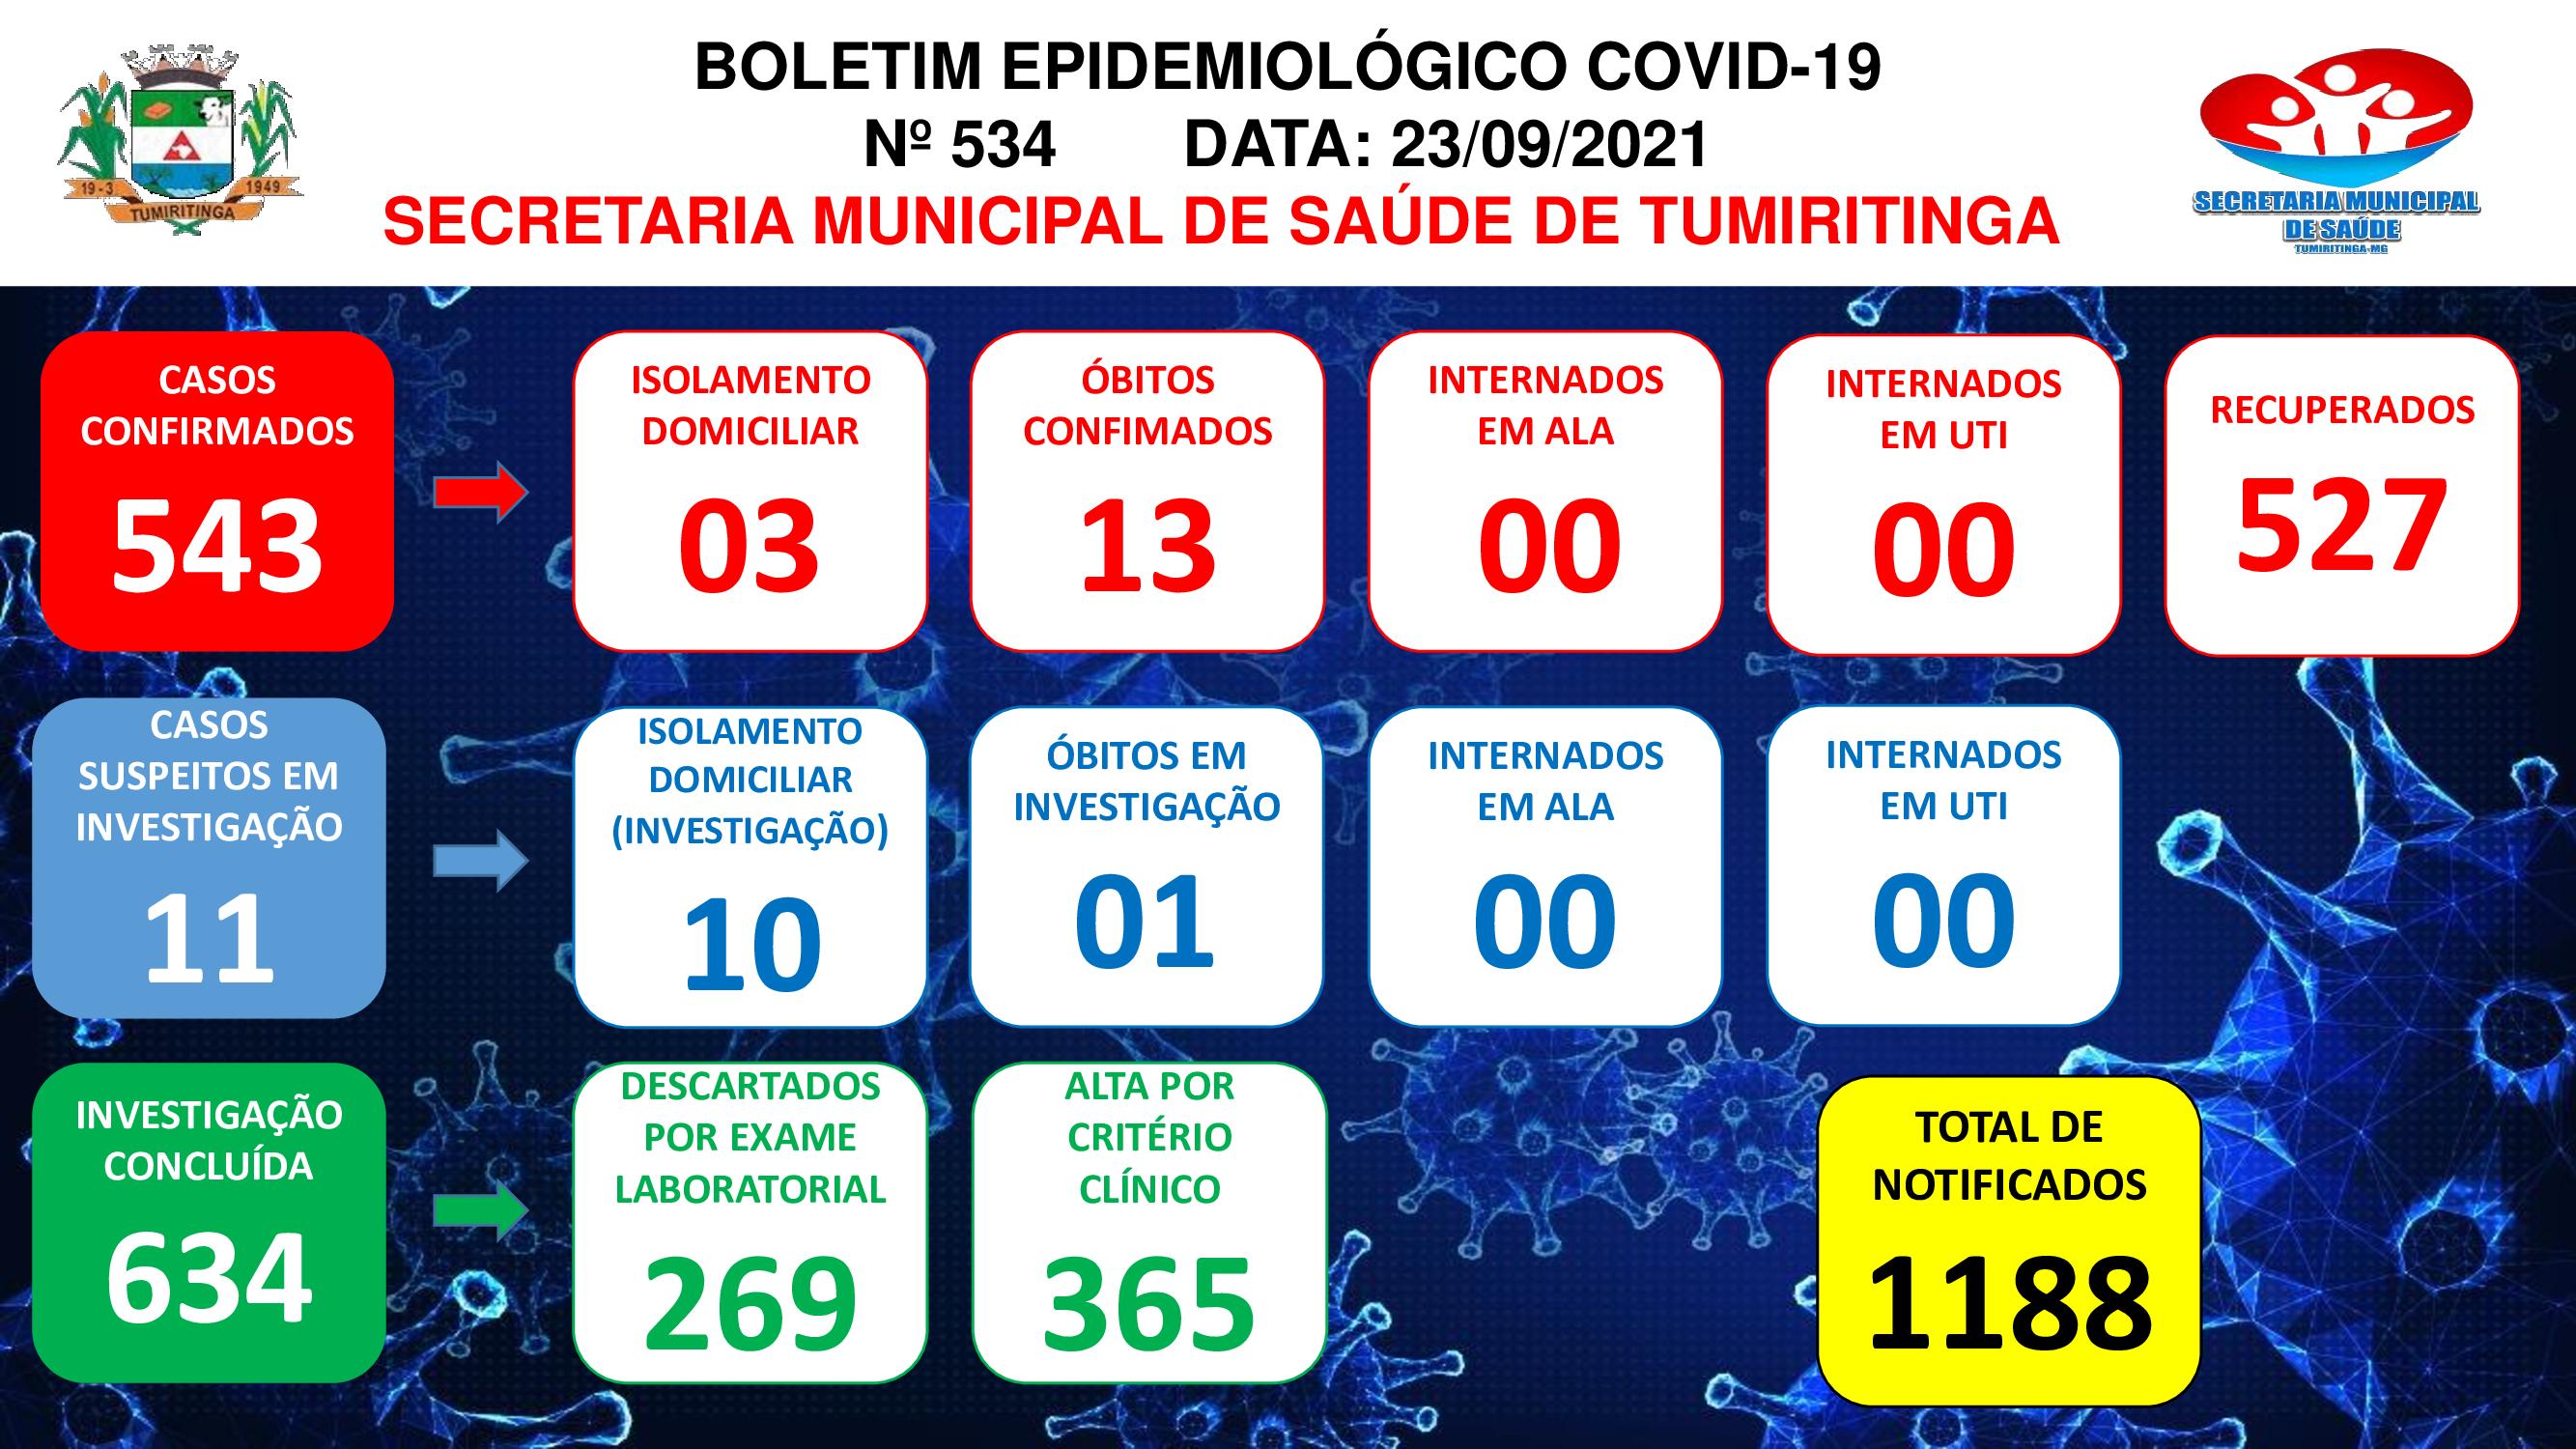 BOLETIM EPIDEMIOLÓGICO CORONAVÍRUS N° 534 - 23/09/2021